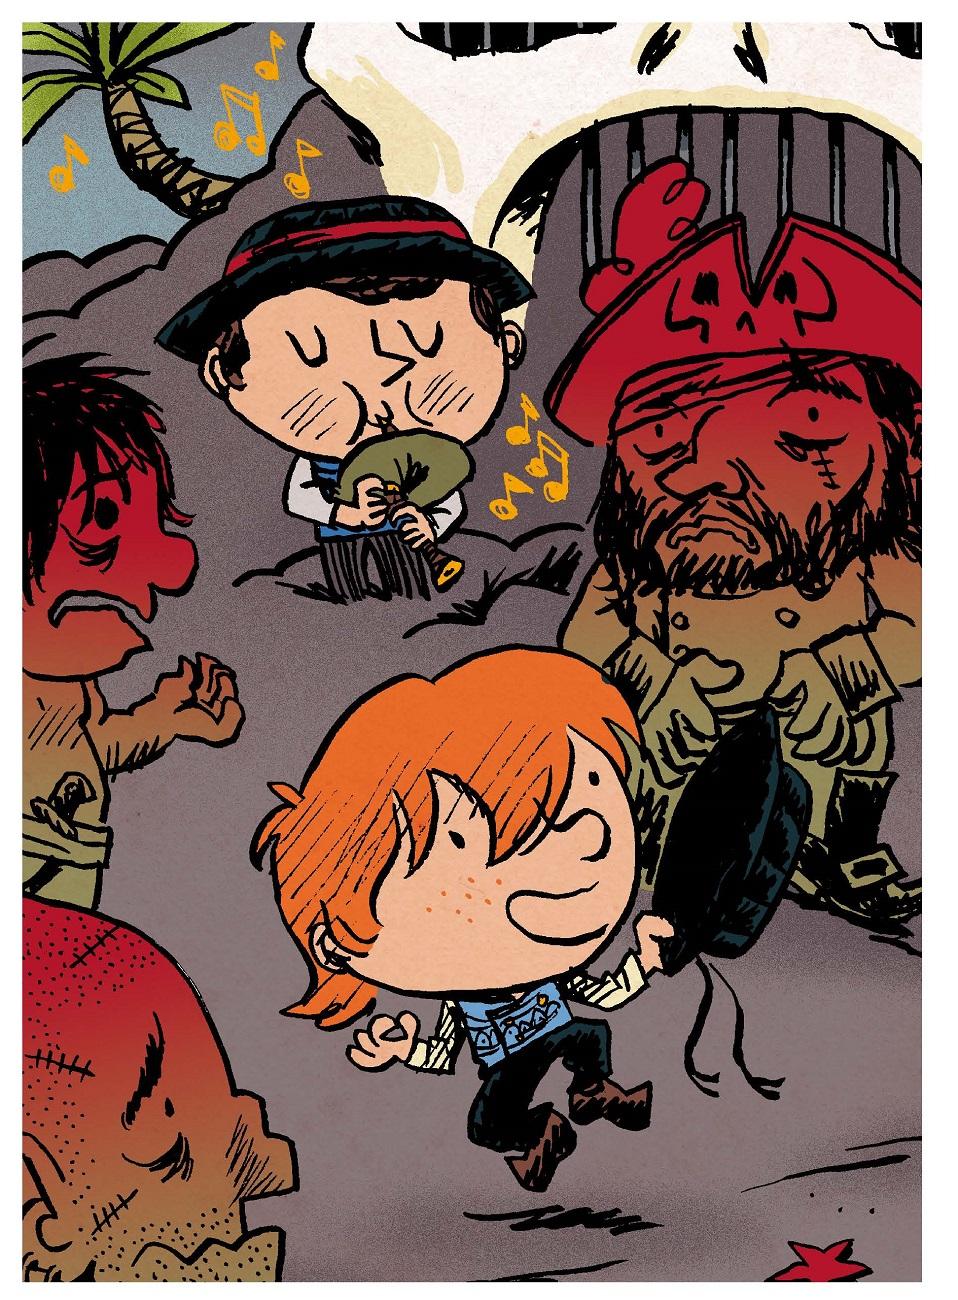 Pirate ! Le pirate qui avait le mal de mer page 25